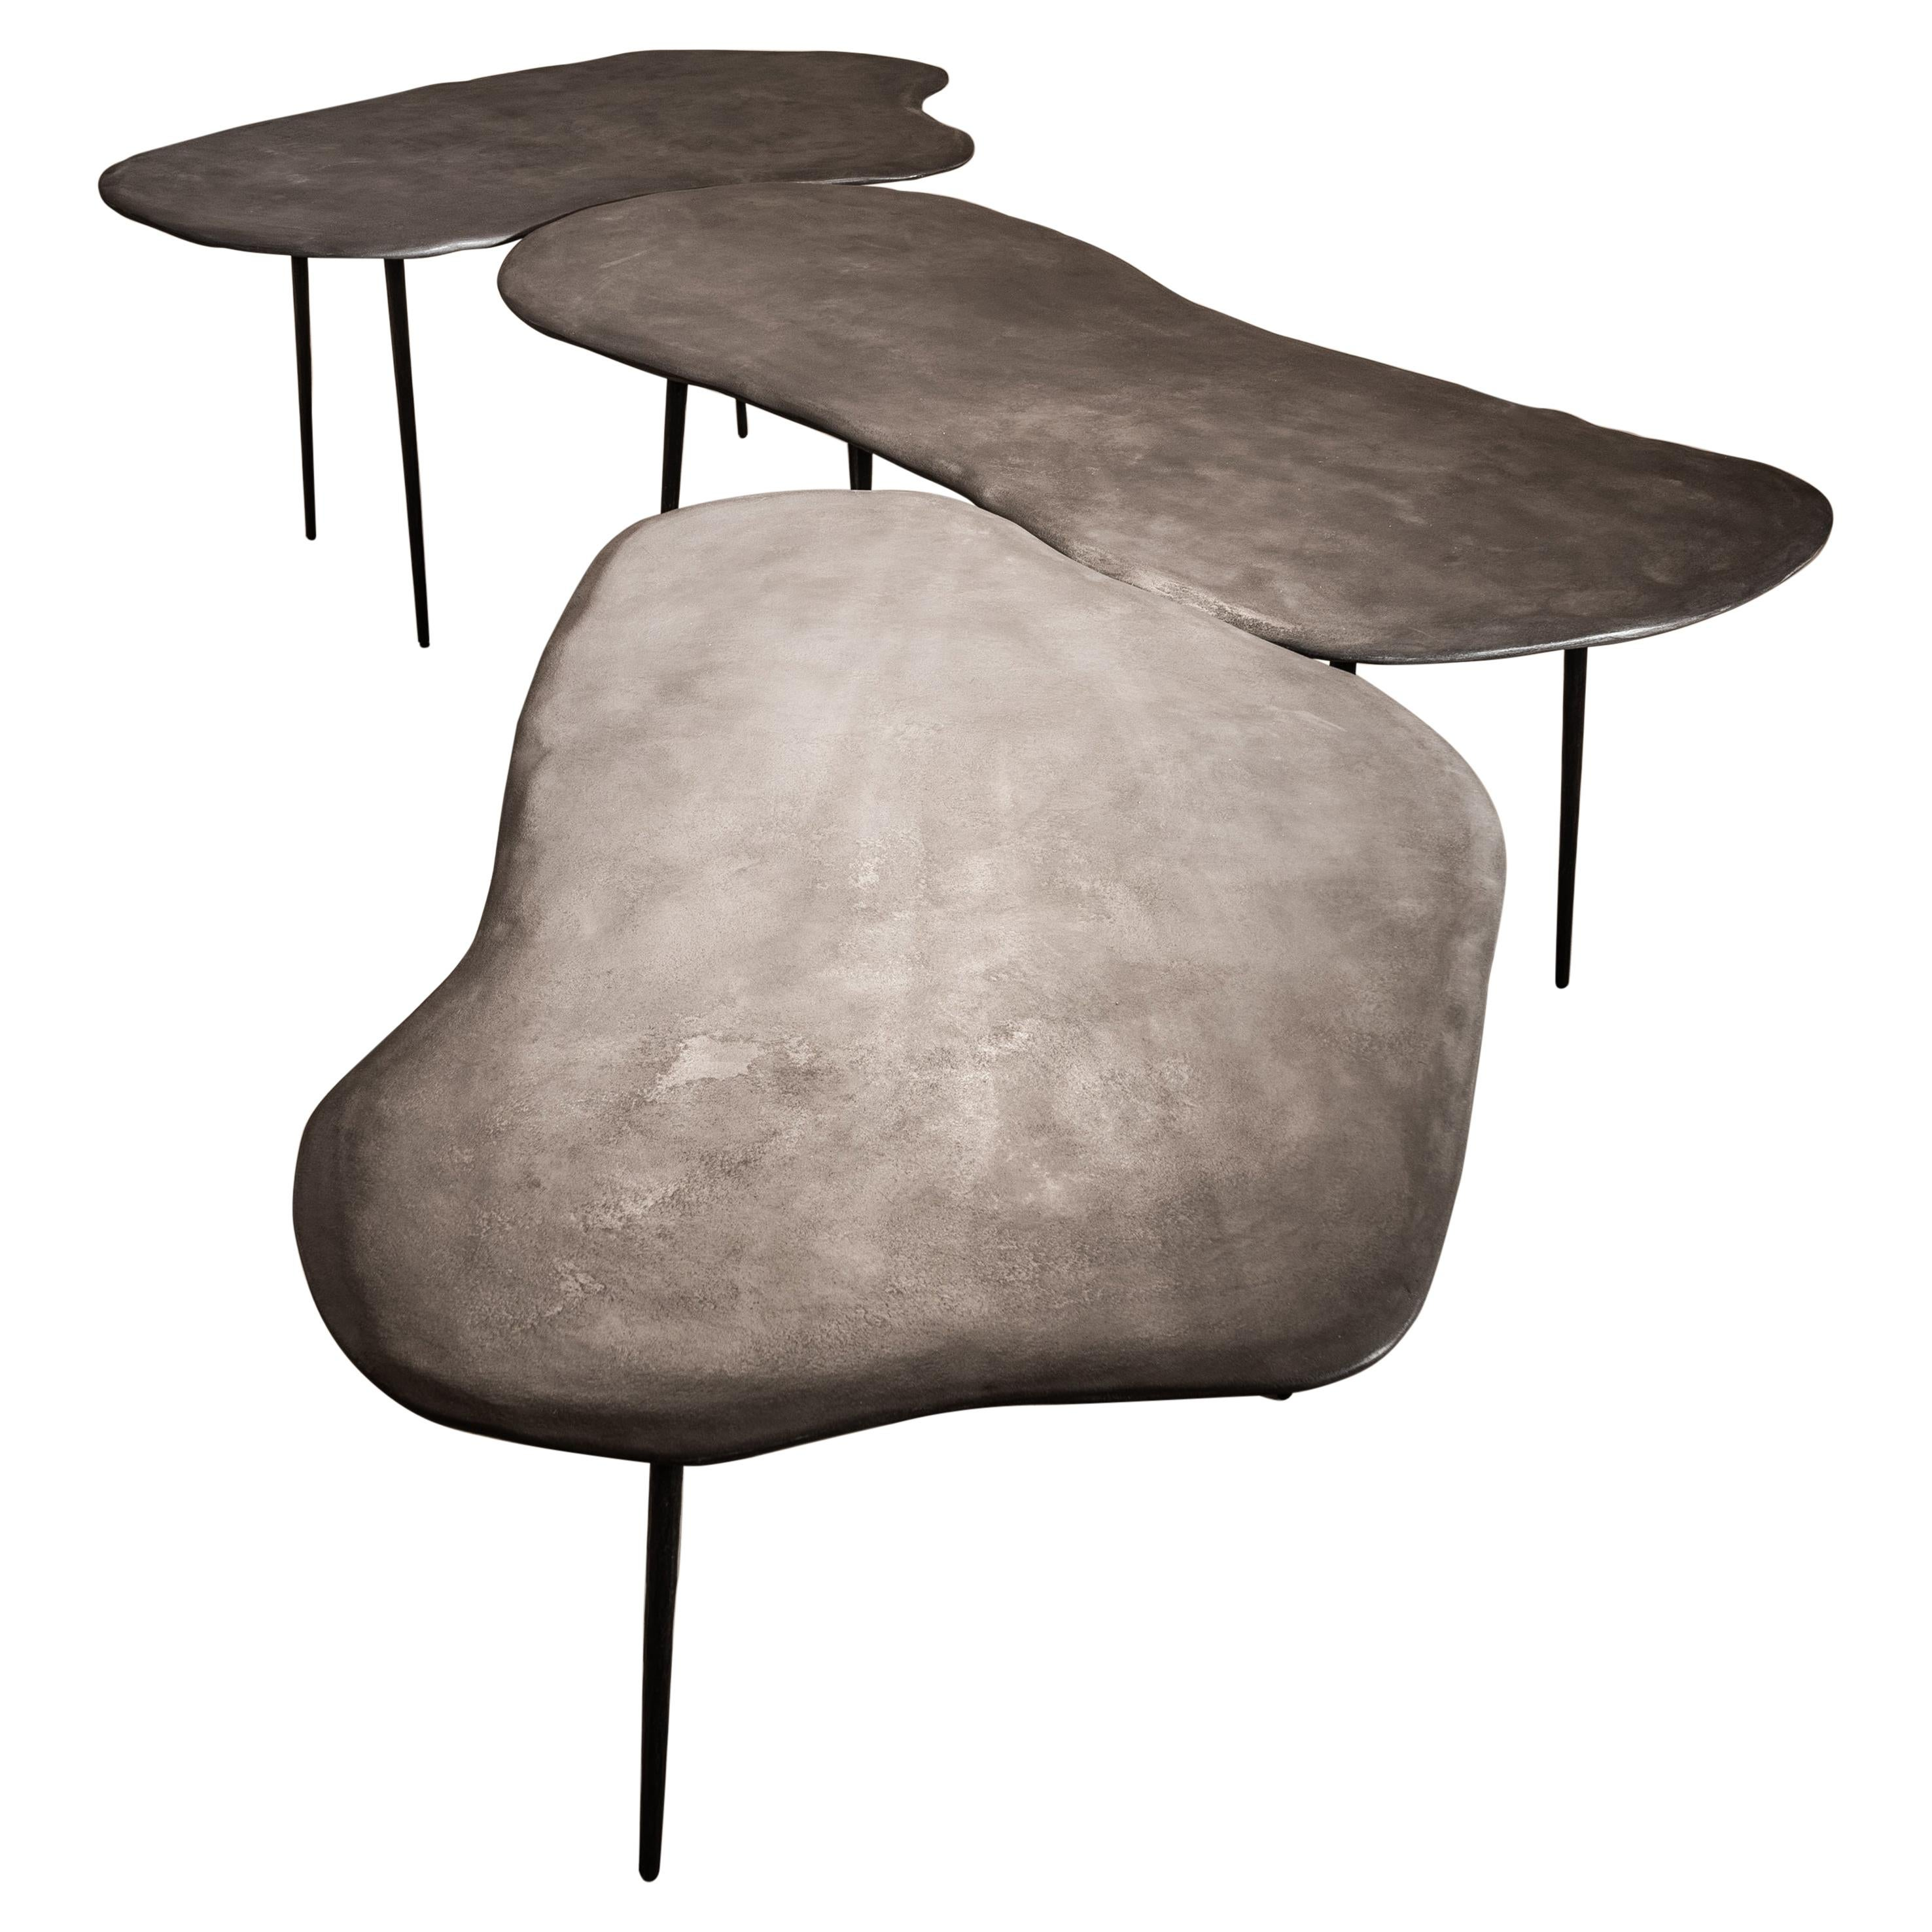 Varenna Table Trio by Studio Emblématique